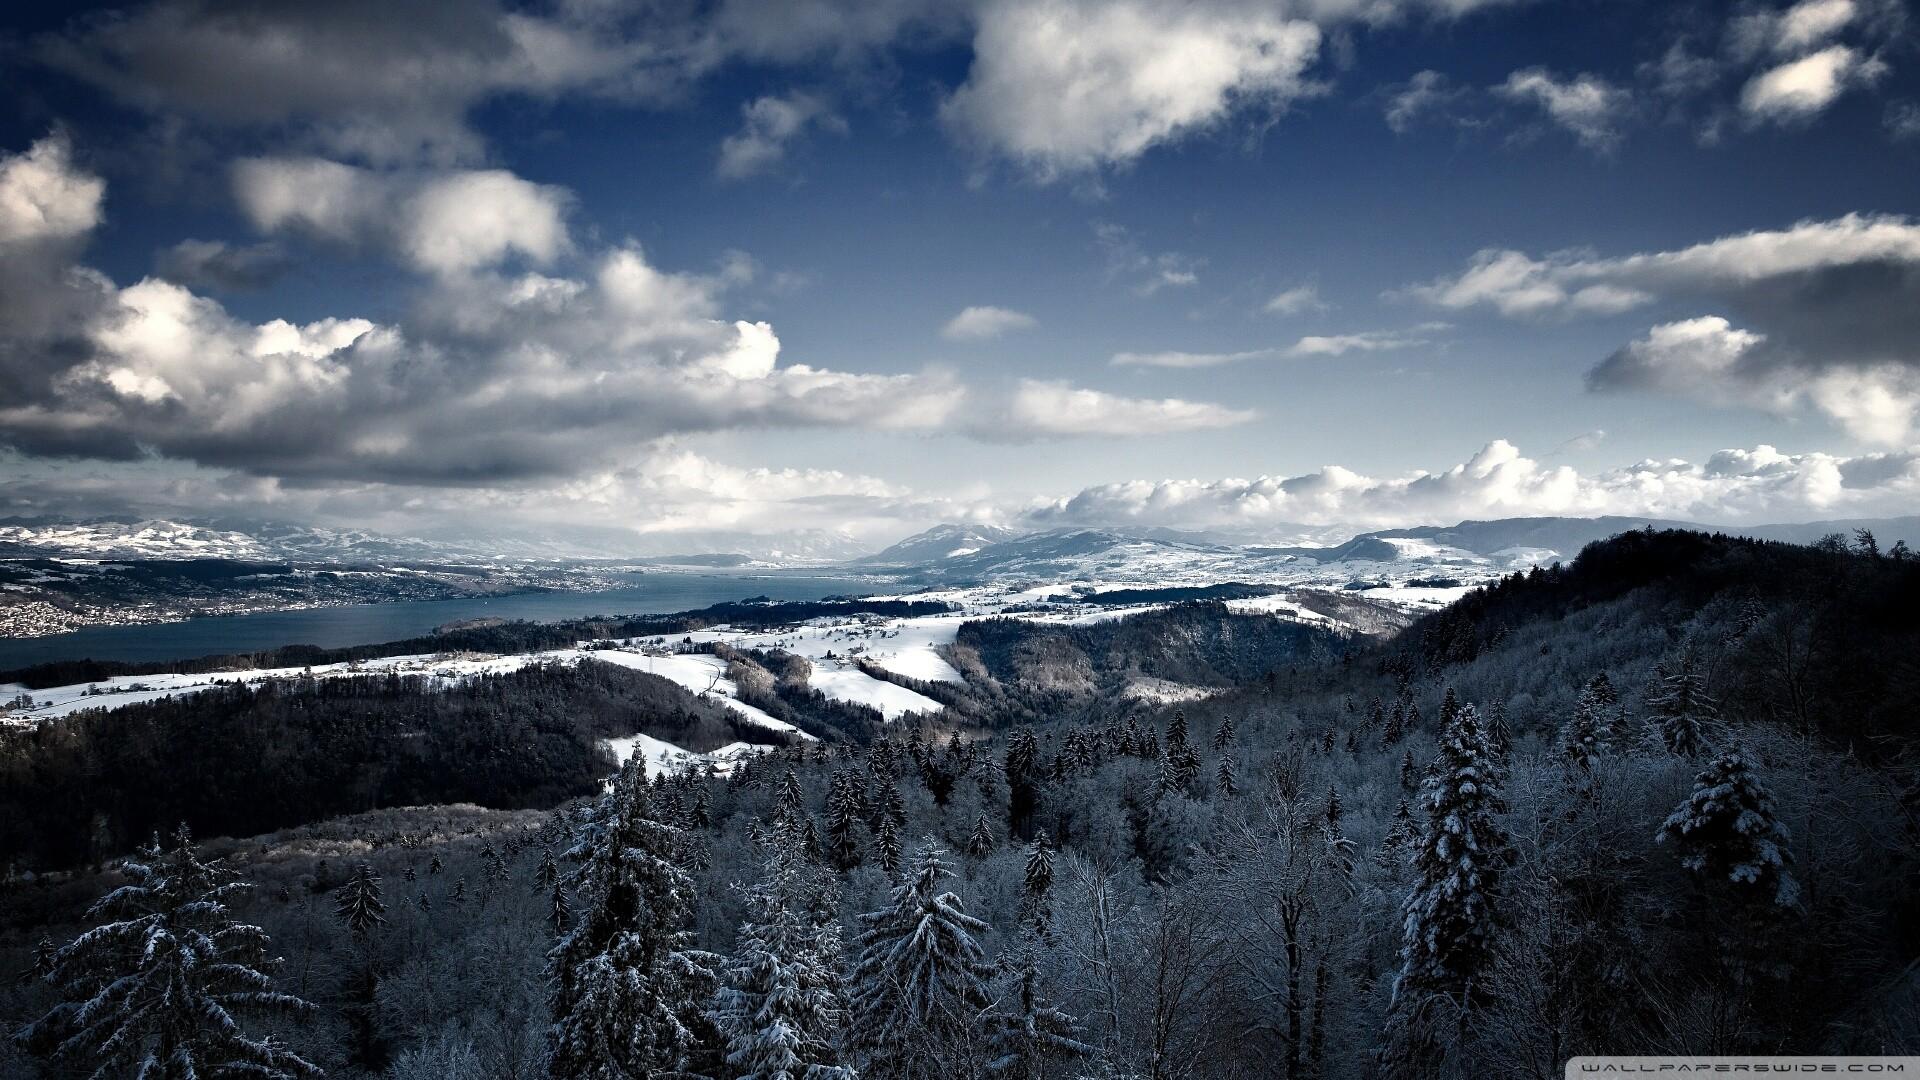 Mountains Winter Wallpaper Mountains, Winter